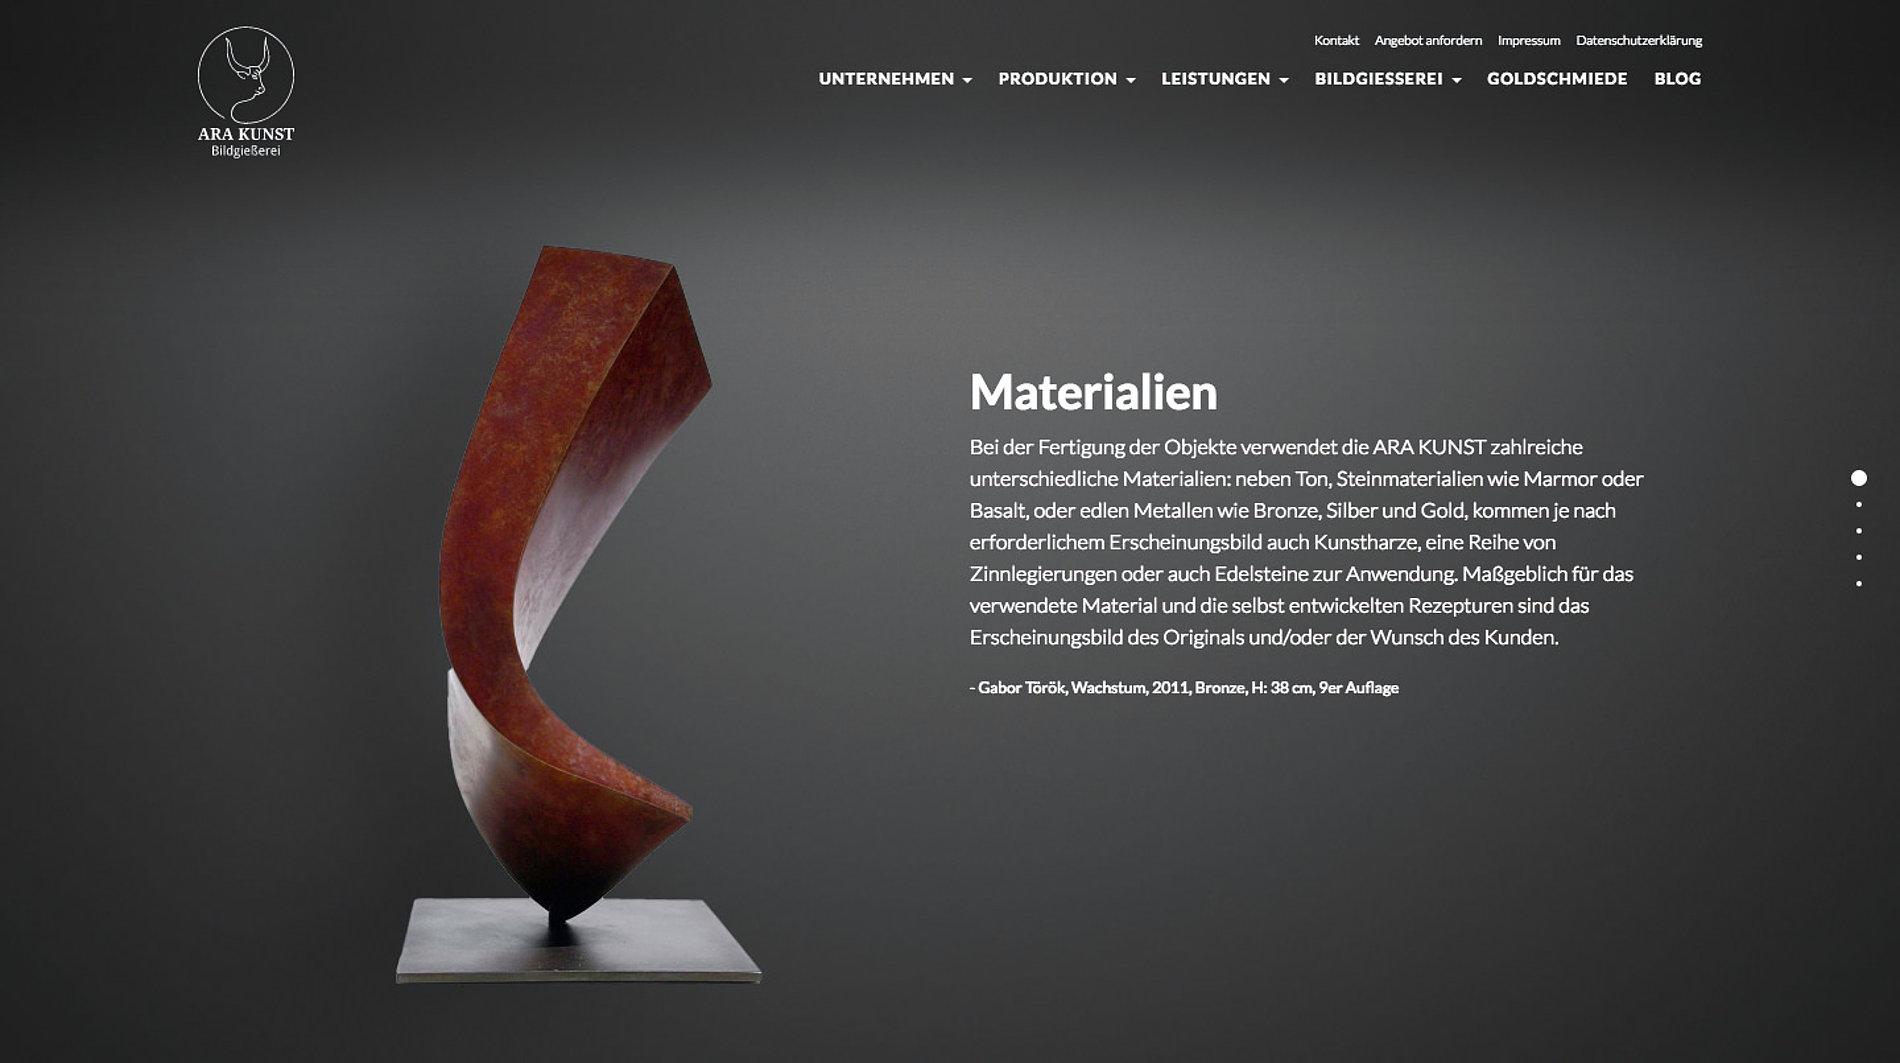 ARA KUNST | Red Dot Design Award